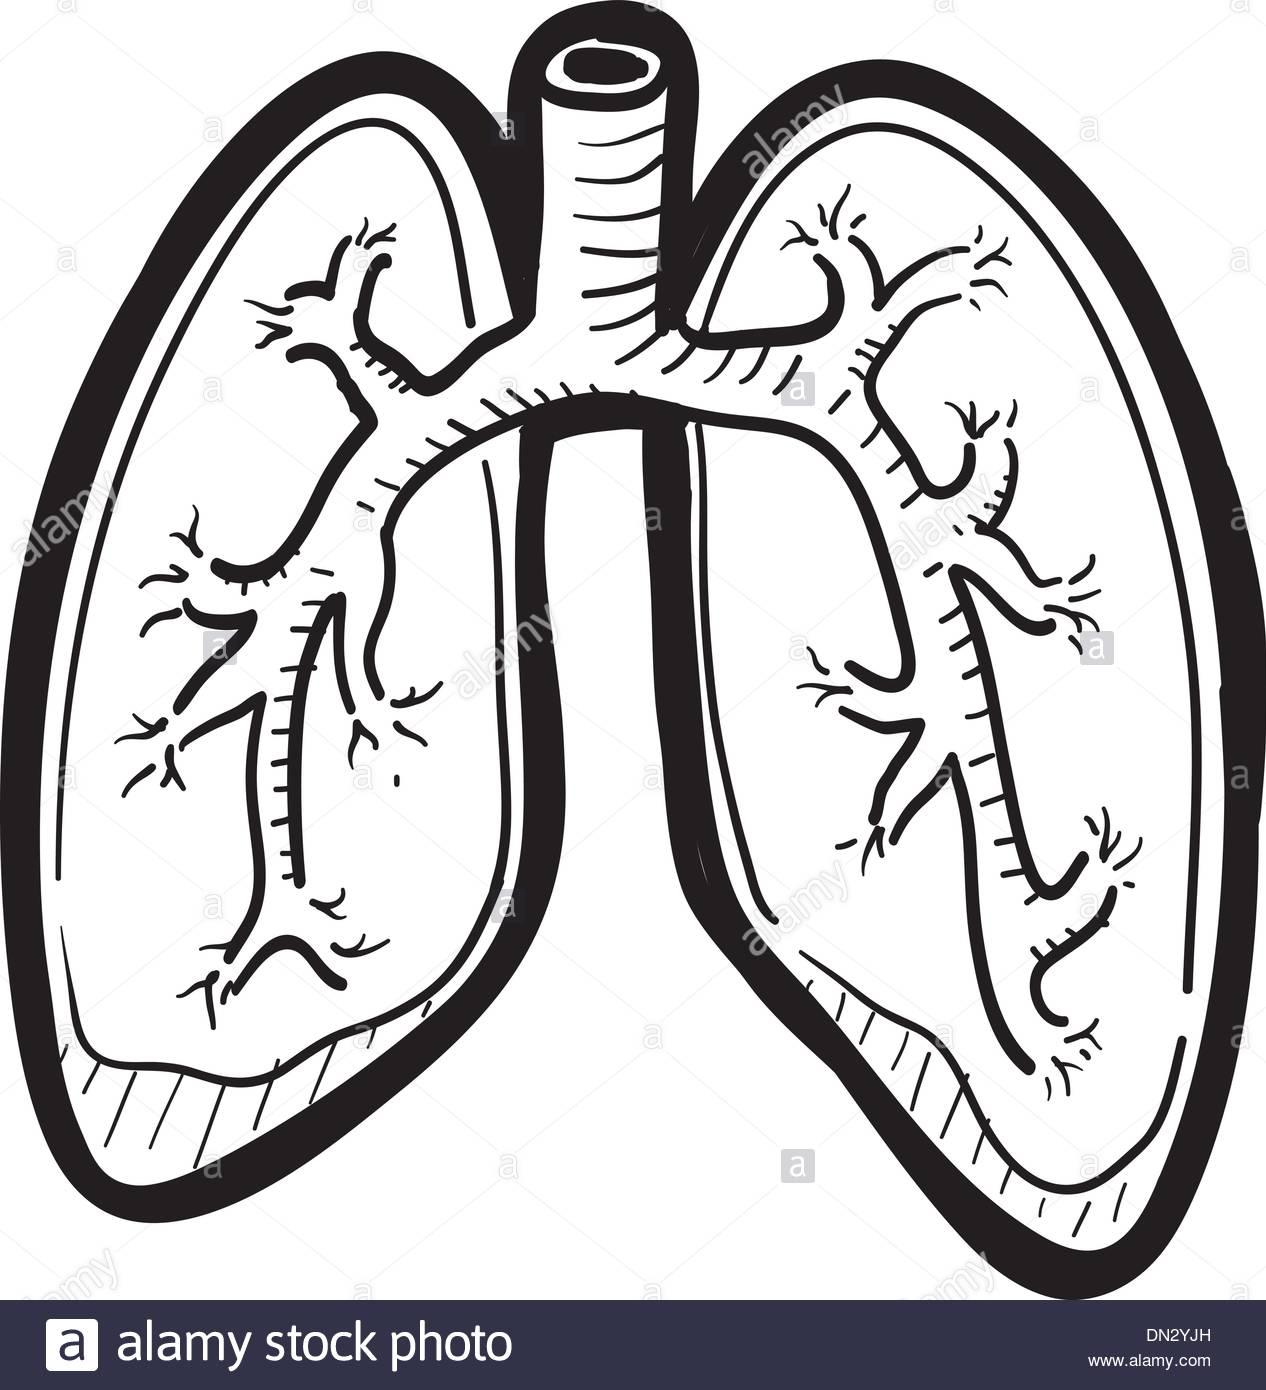 1266x1390 Human Lung Sketch Stock Vector Art Amp Illustration, Vector Image